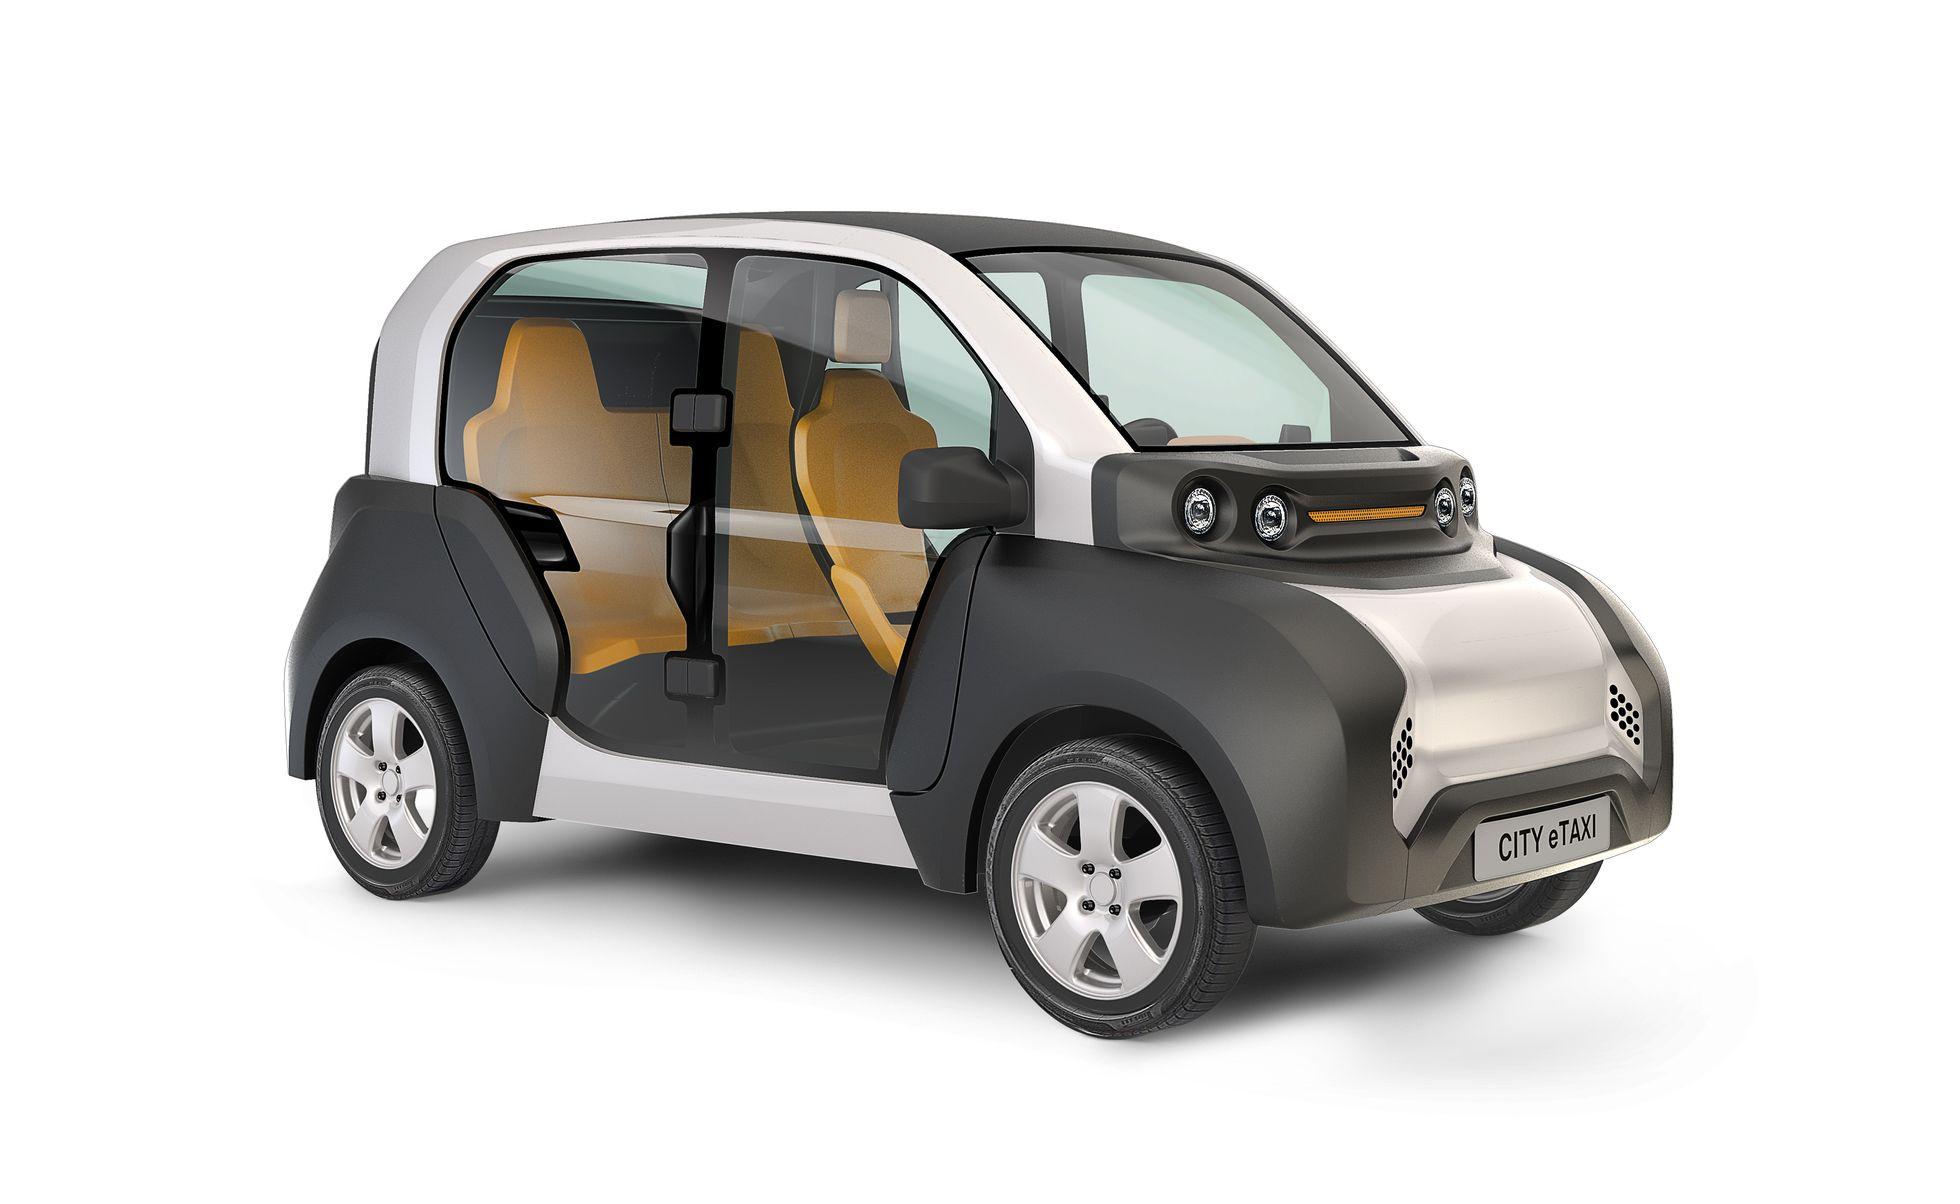 City E-Taxi: Ein Elektrotaxi mit Durchblick - Das City E-Taxi ist ein Elektroauto. (Bild: Naumann-Design)